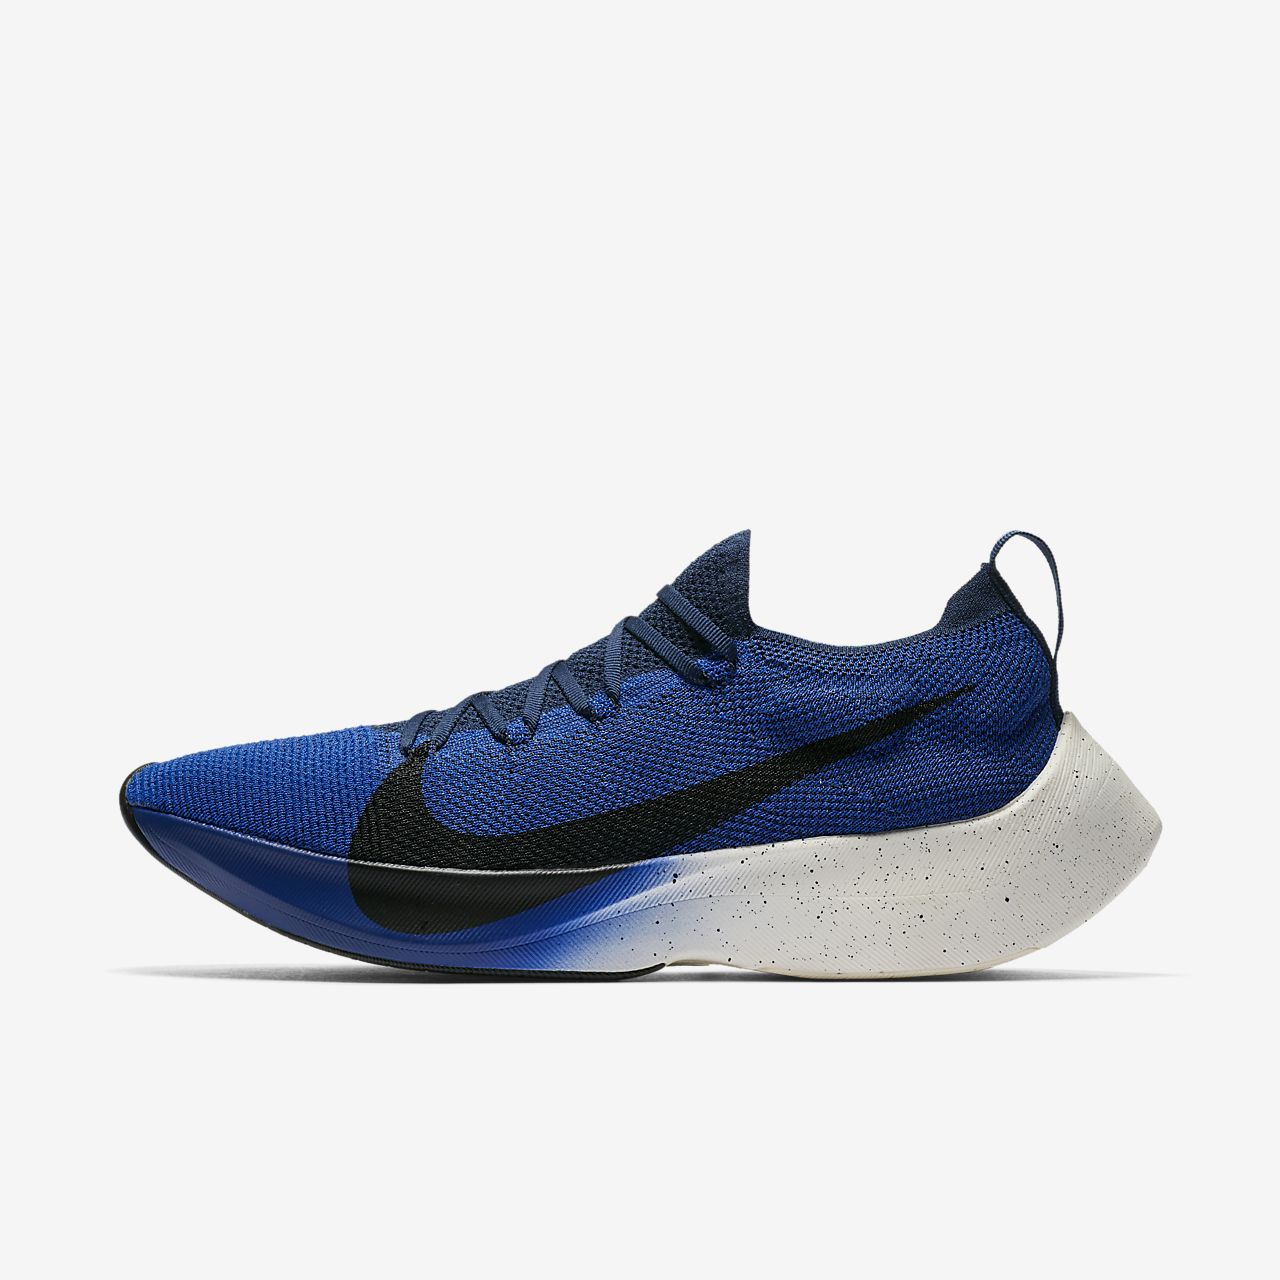 af469ebb2630 Nike React Vapor Street Flyknit Men s Shoe. Nike.com CA